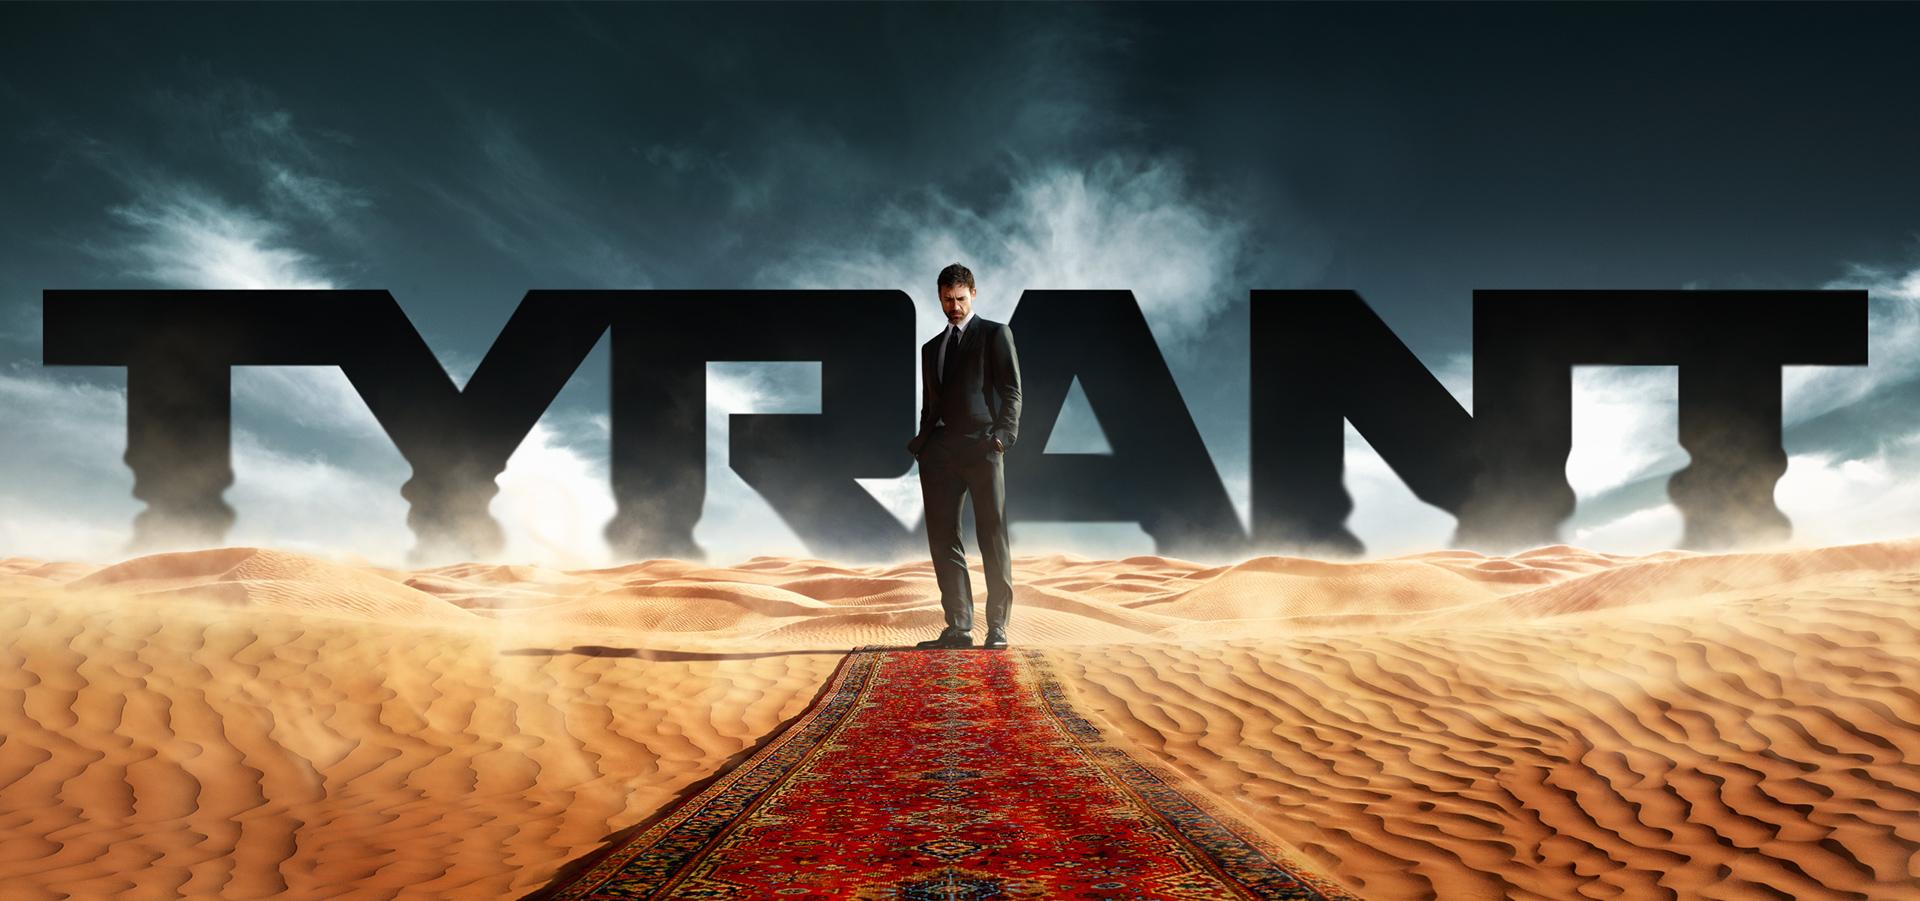 Tyrant-Fullscreen-Image